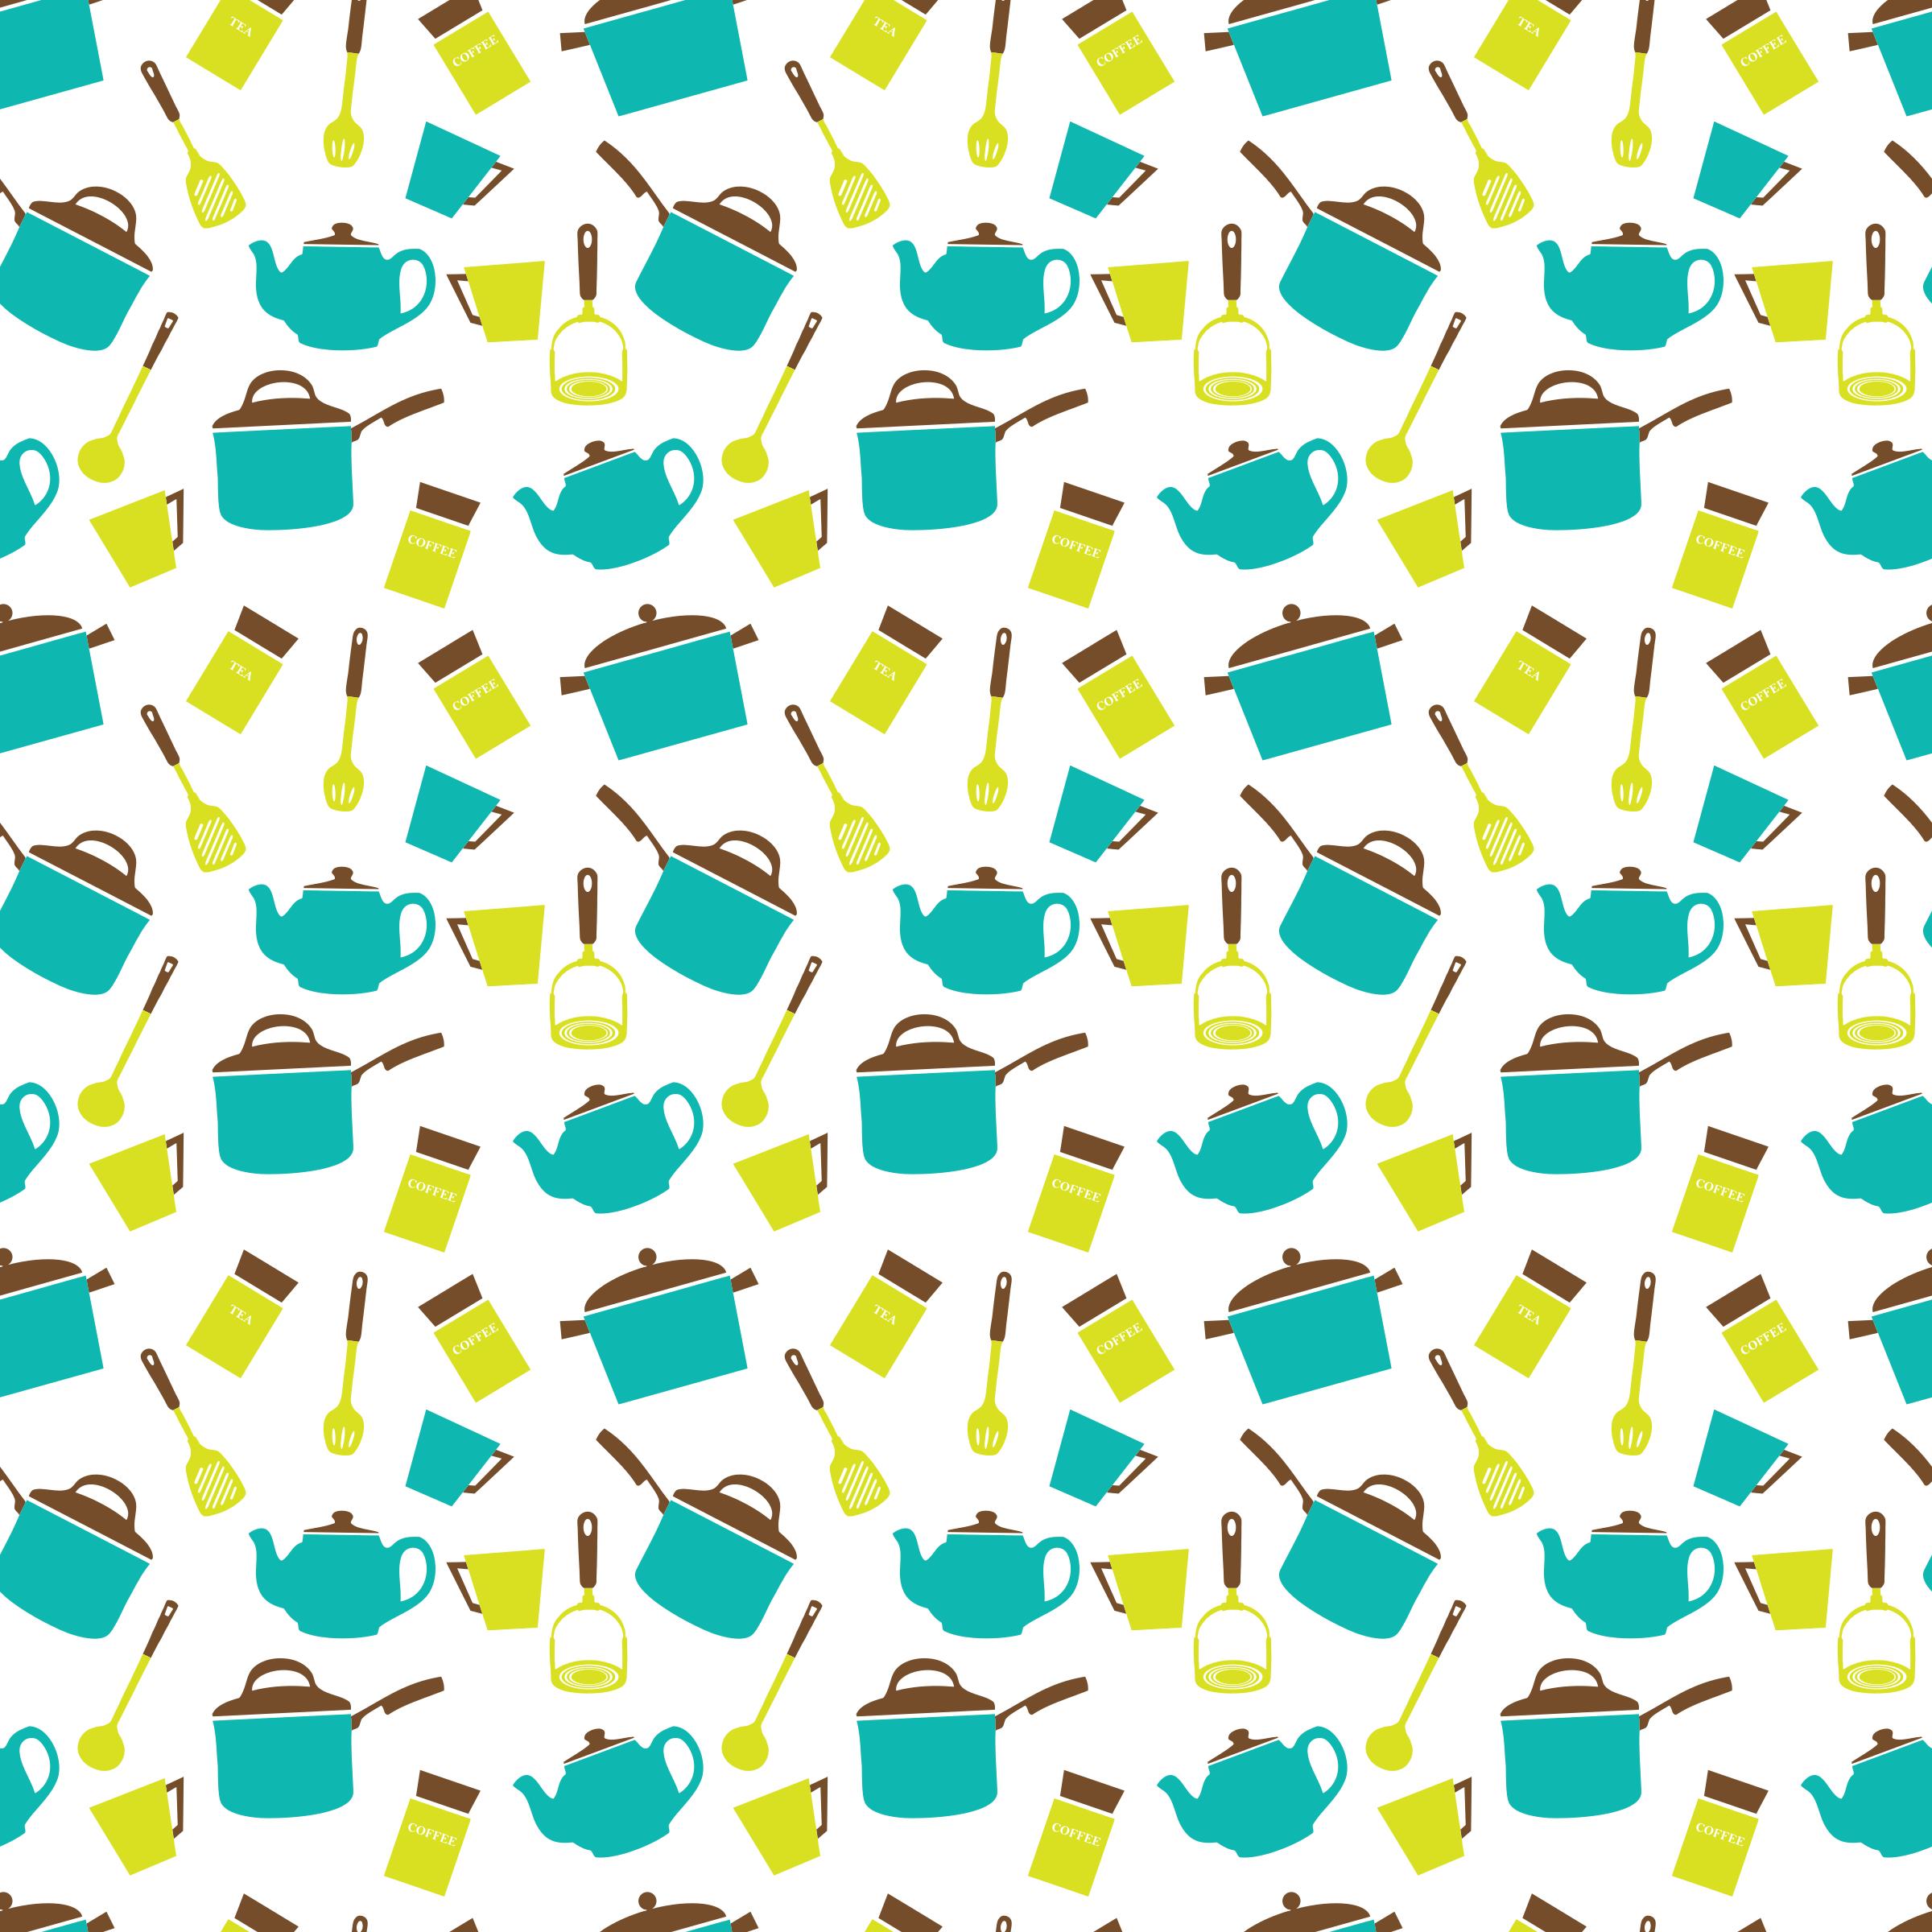 Teapot clipart kitchen utensil Seamless pattern Utensils seamless Crockery